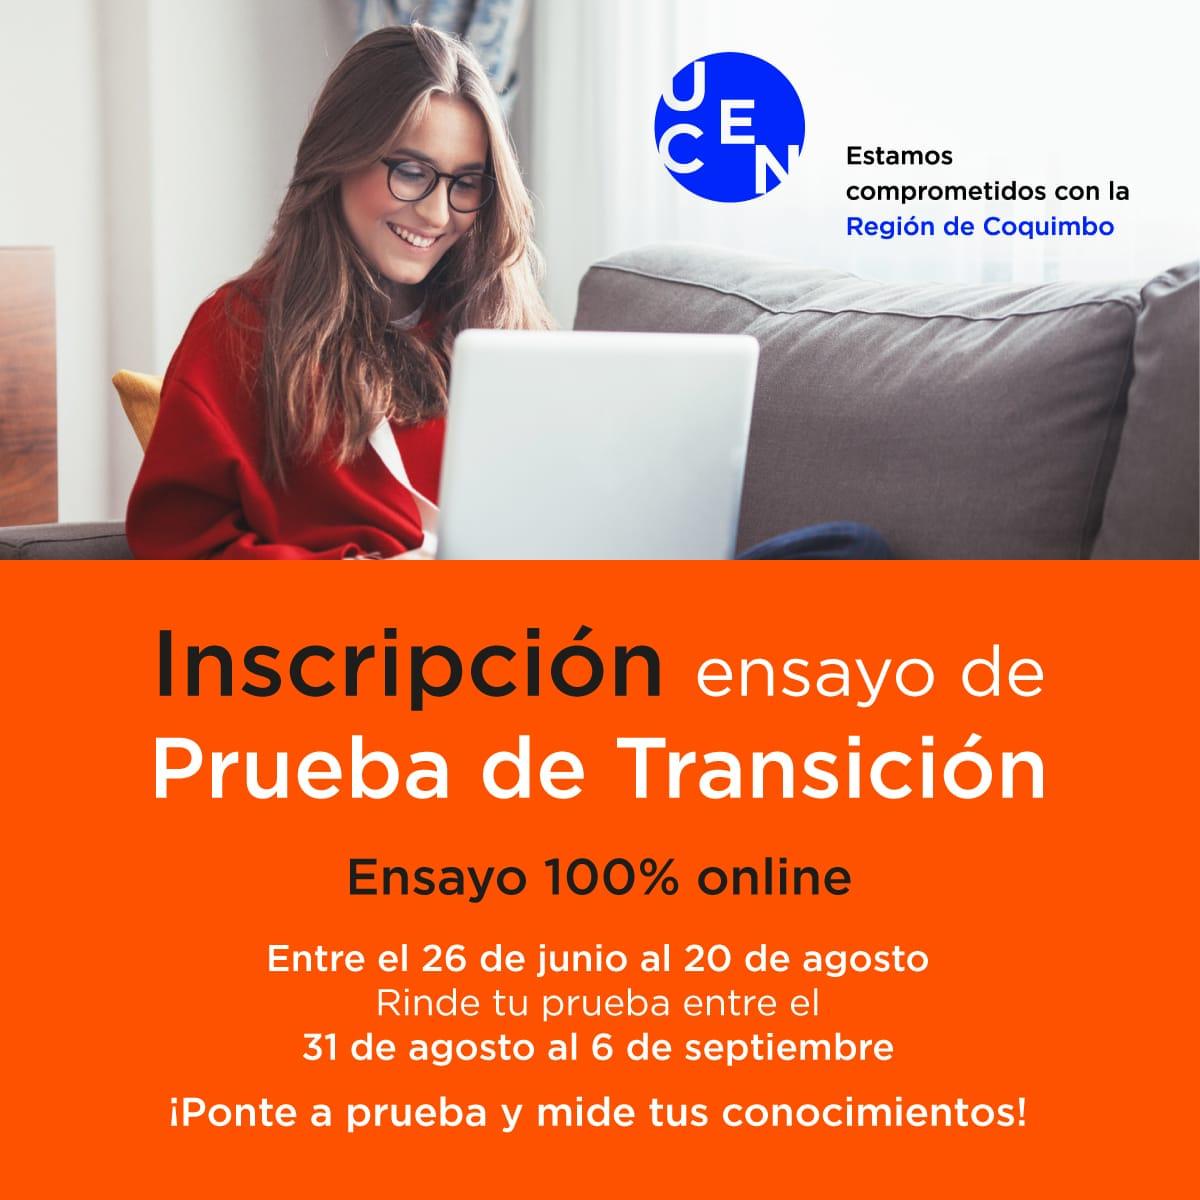 PRUEBA DE TRANSICION